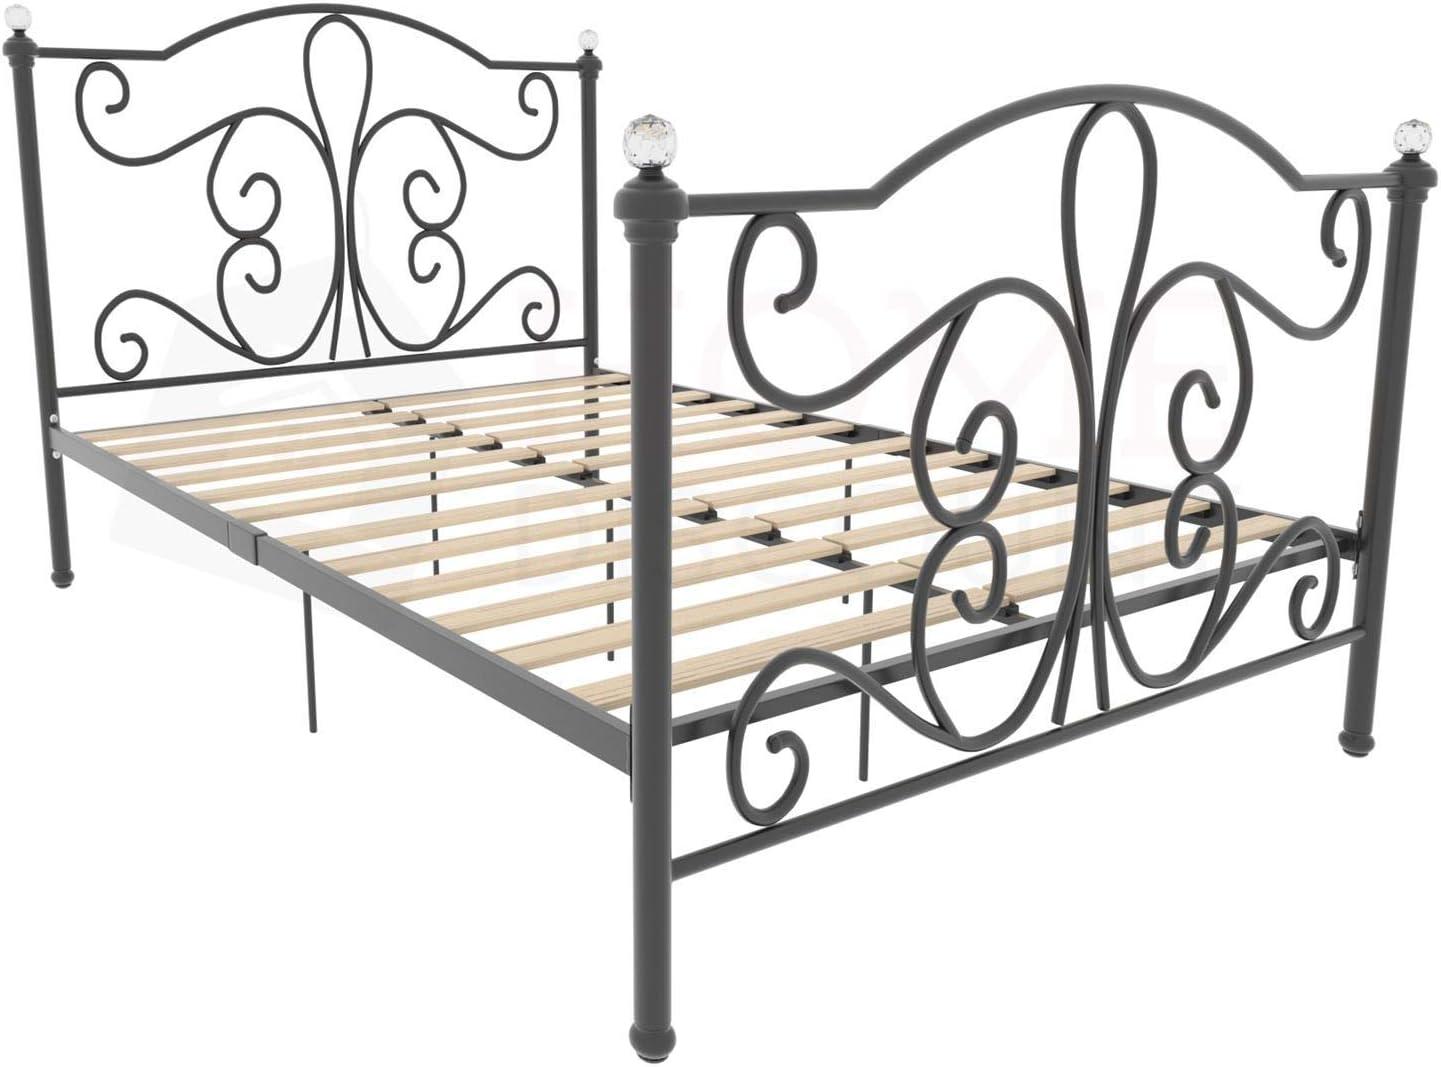 4ft Bed Frame Metal Headboard High Foot End Bedroom Furniture Vida Designs Chicago Small Double Bed Black